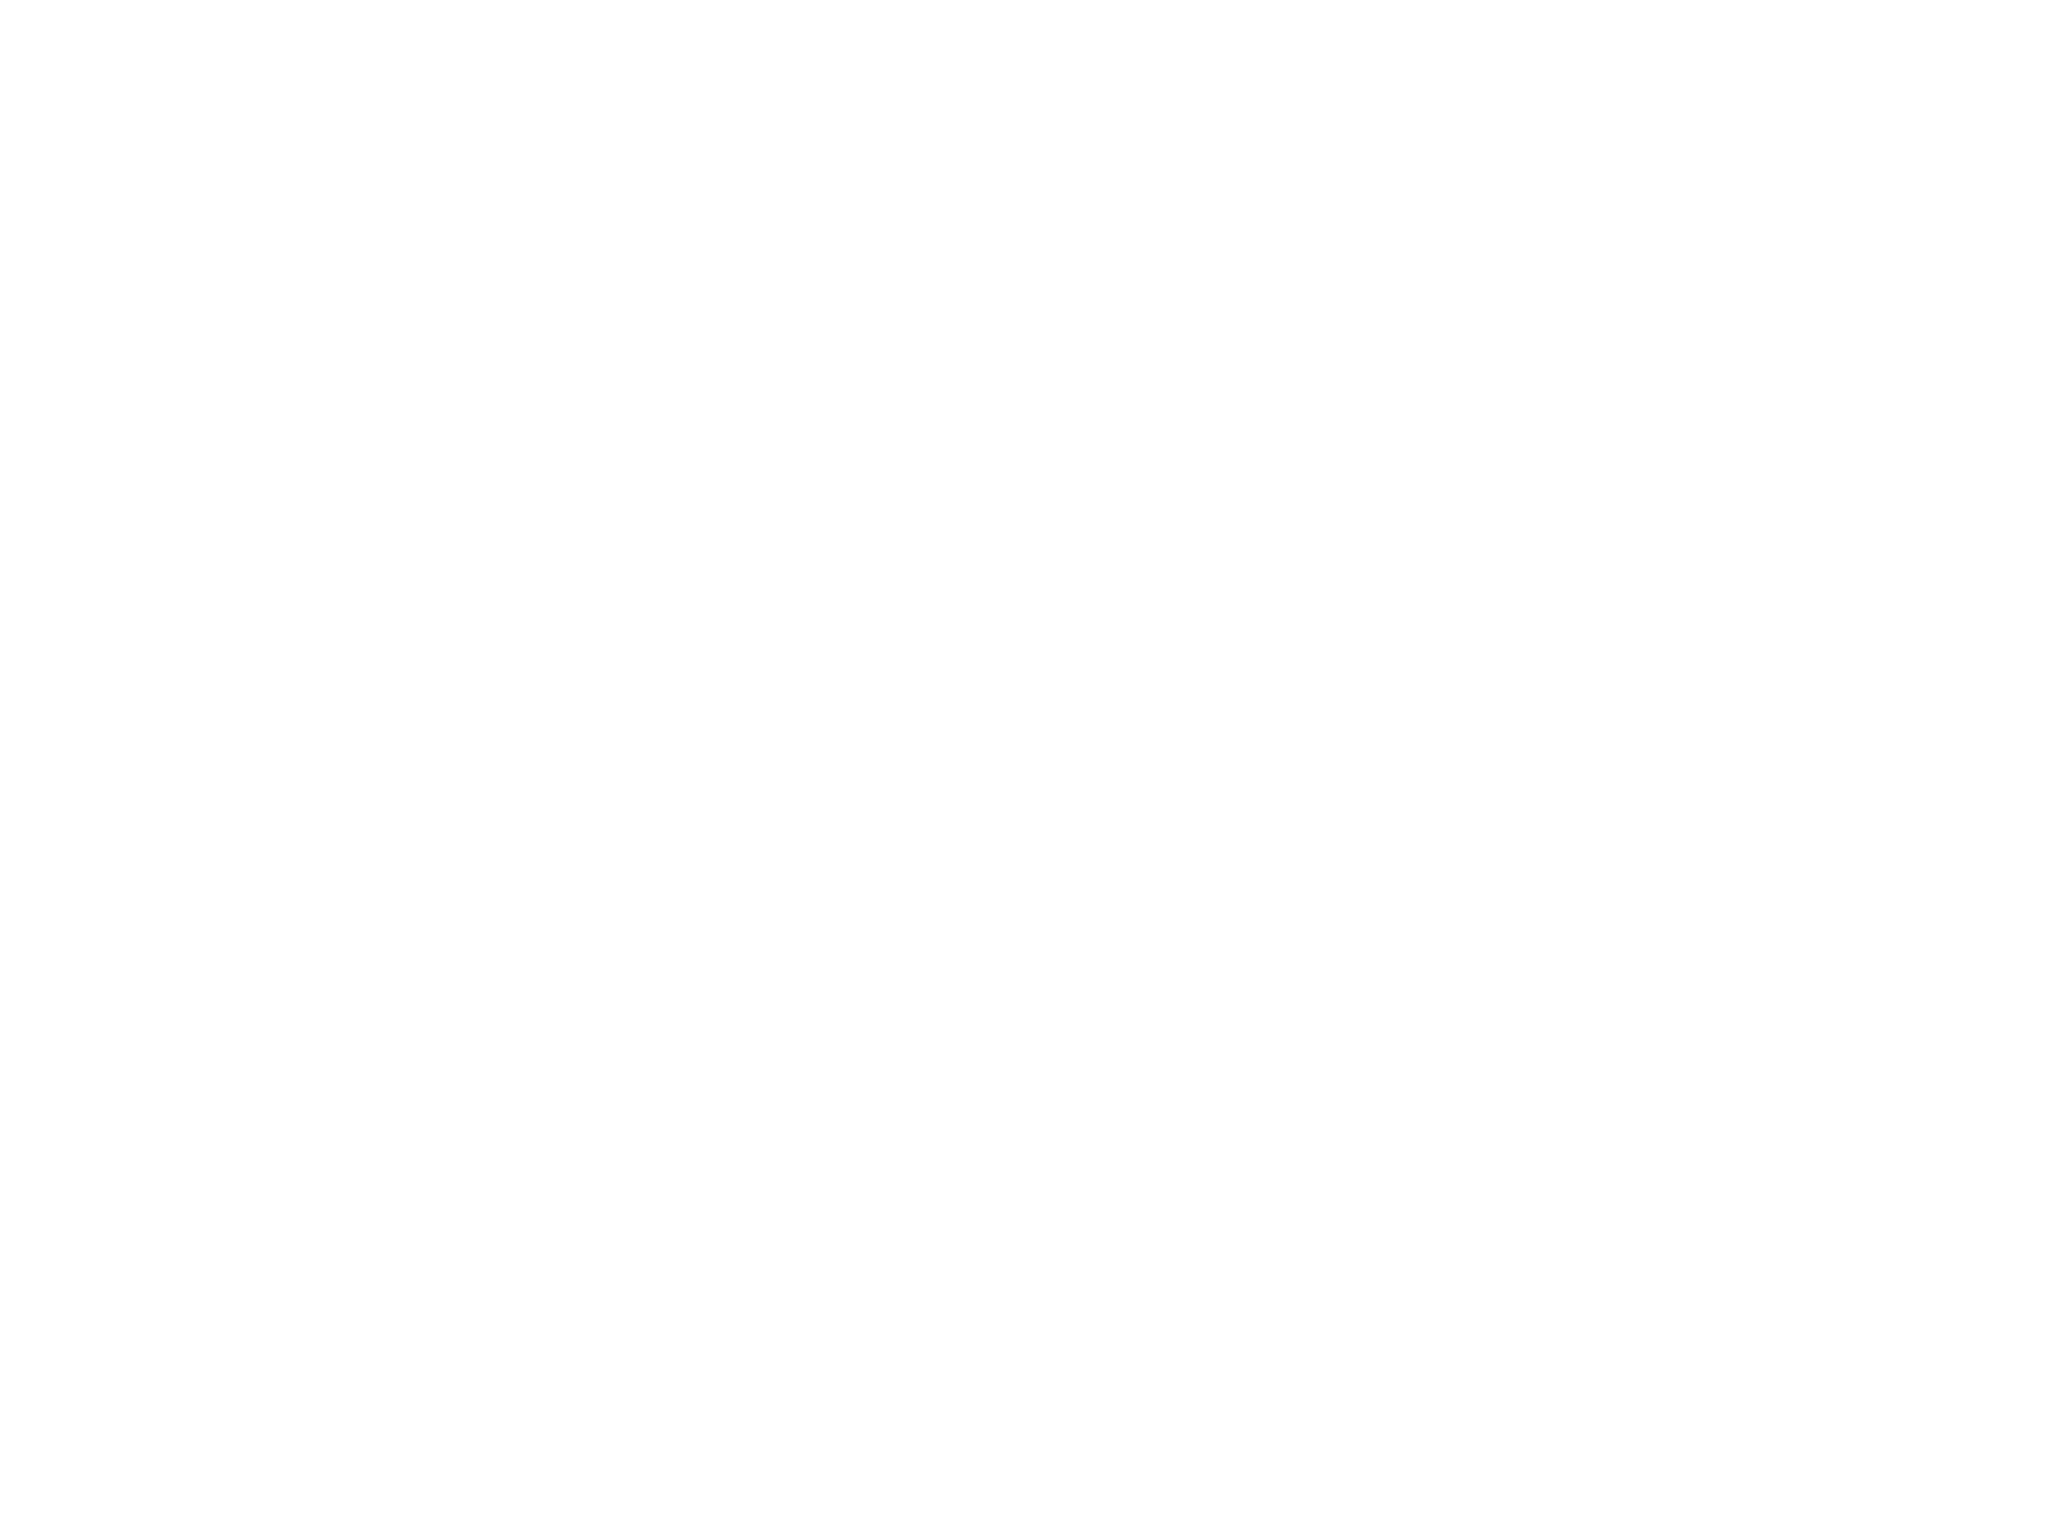 De Amersfoortse Zwaan sluit ivm Corona tot 6 april.